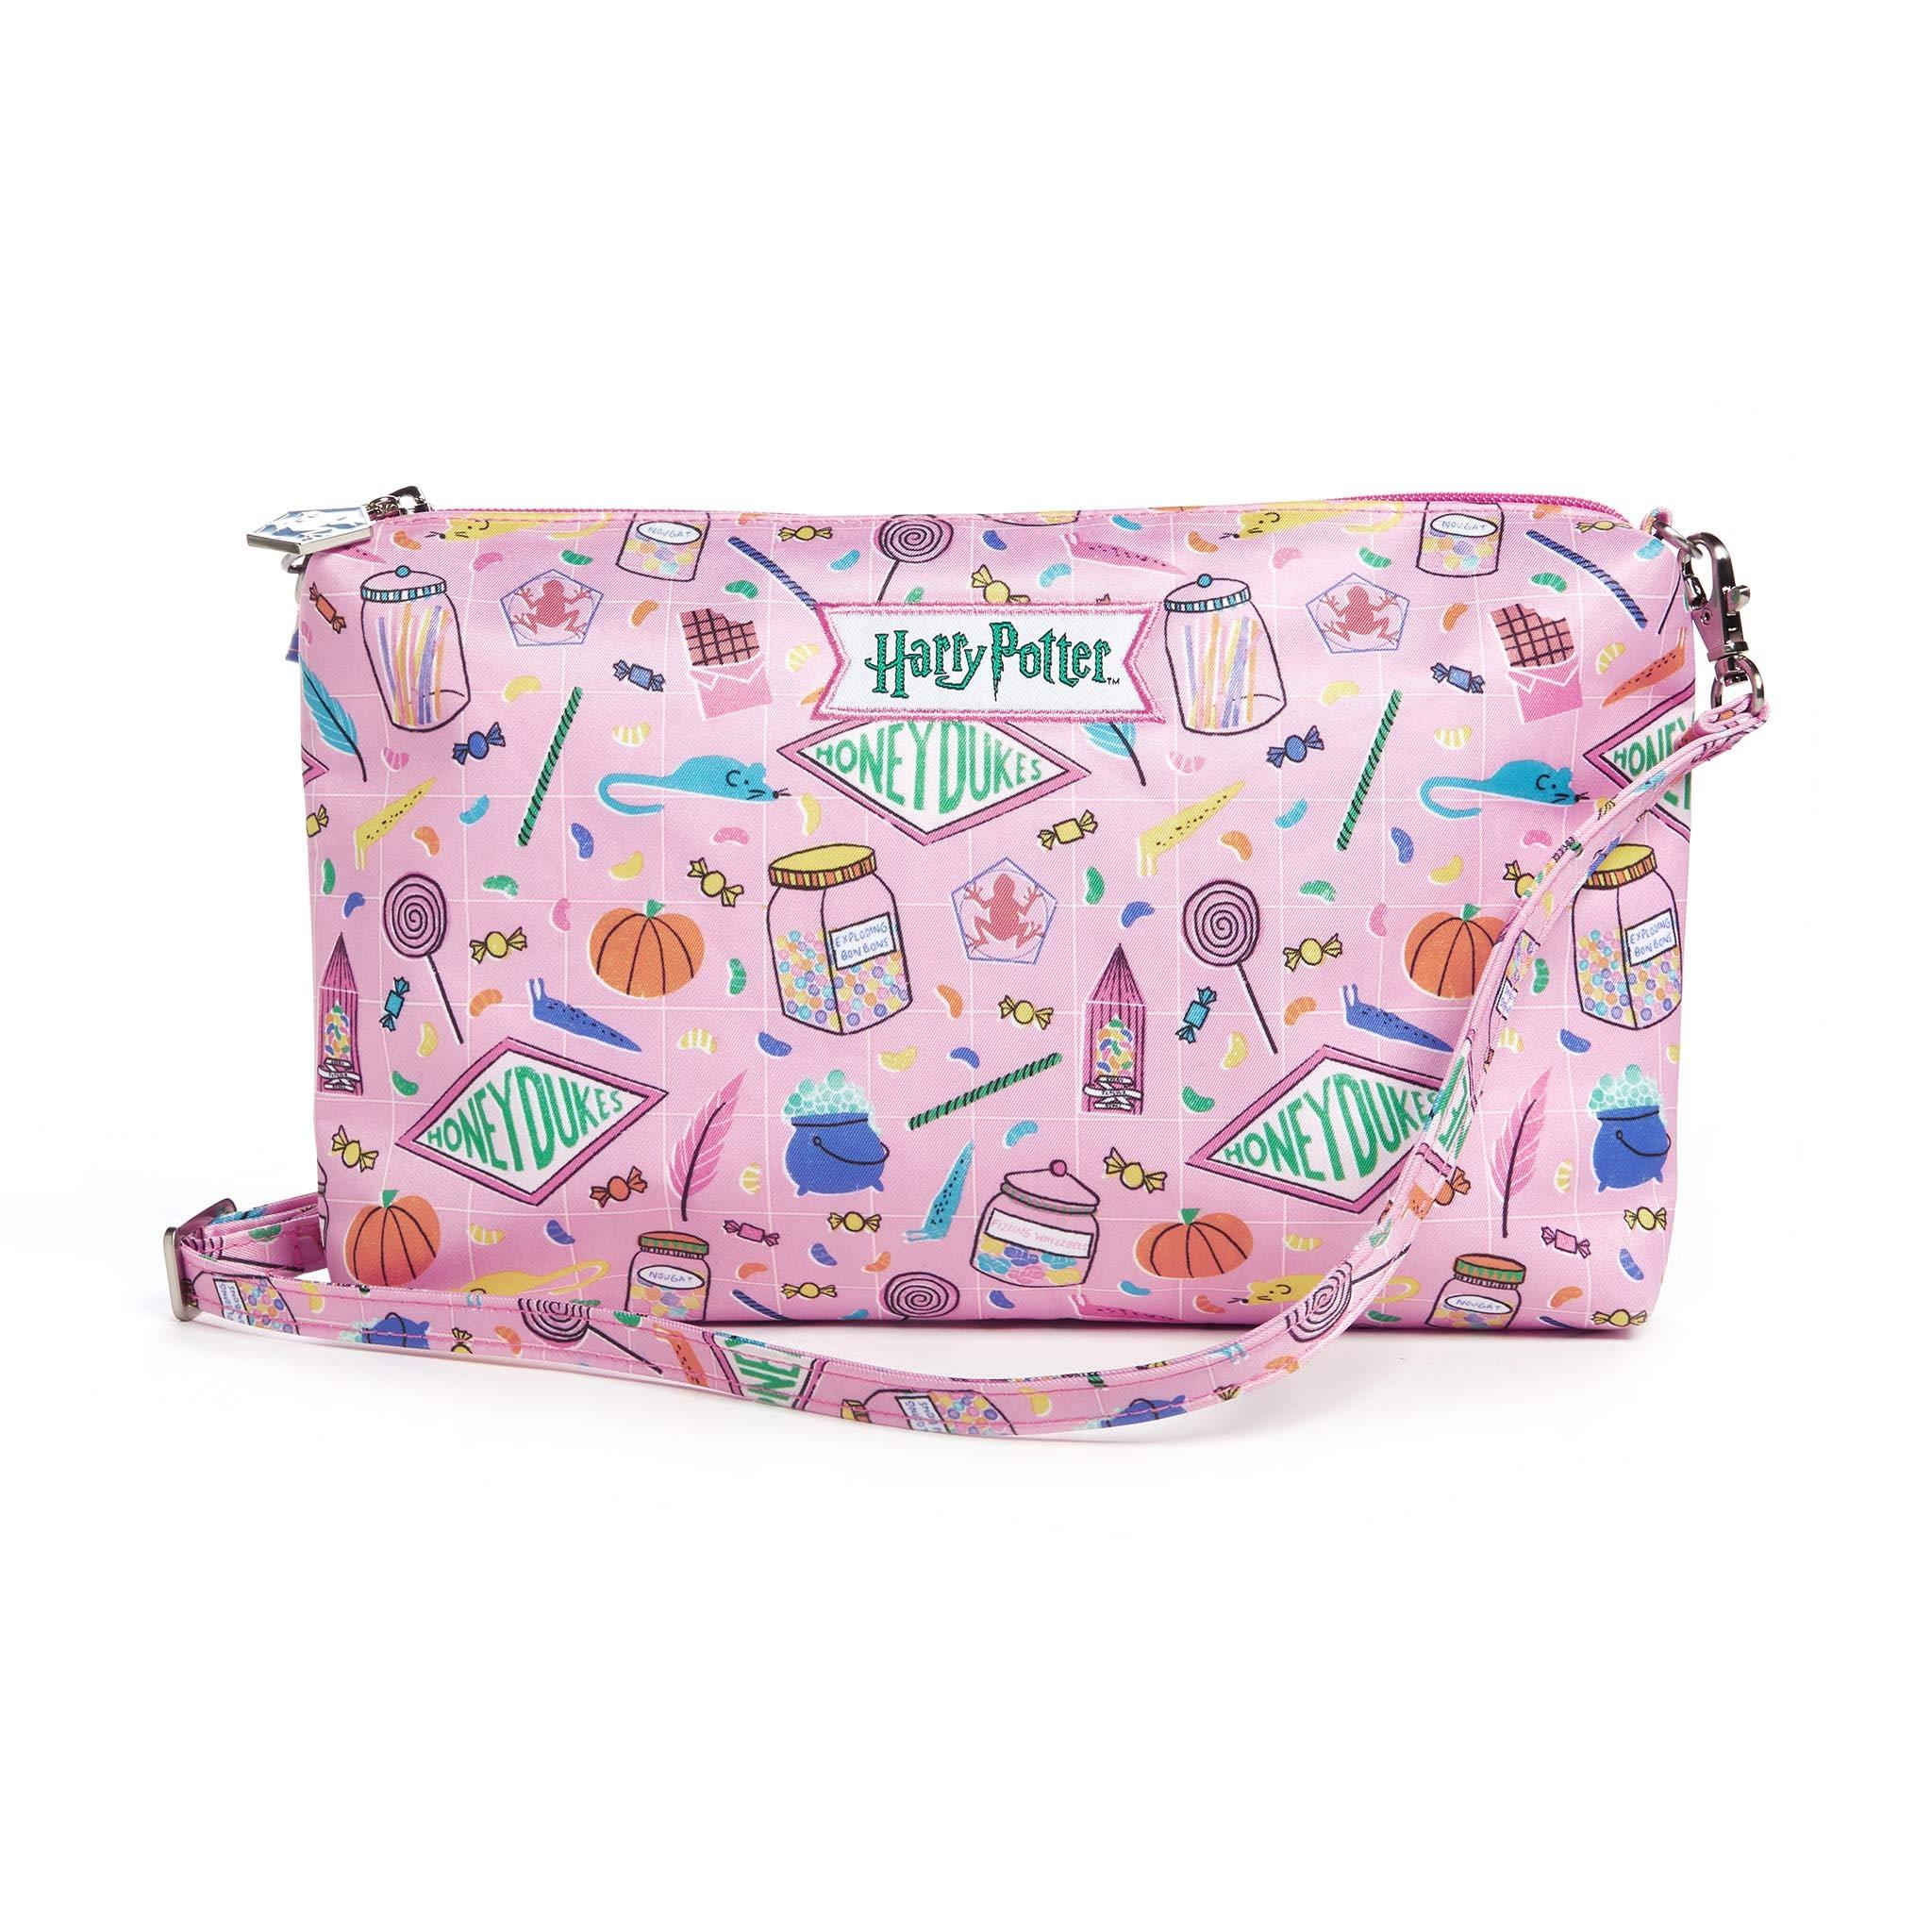 JuJuBe x Harry Potter Diaper Bag Organizer, Be Quick   Wristlet + Travel Pouch for Purse, Bag Organization, Storage (Honeydukes)